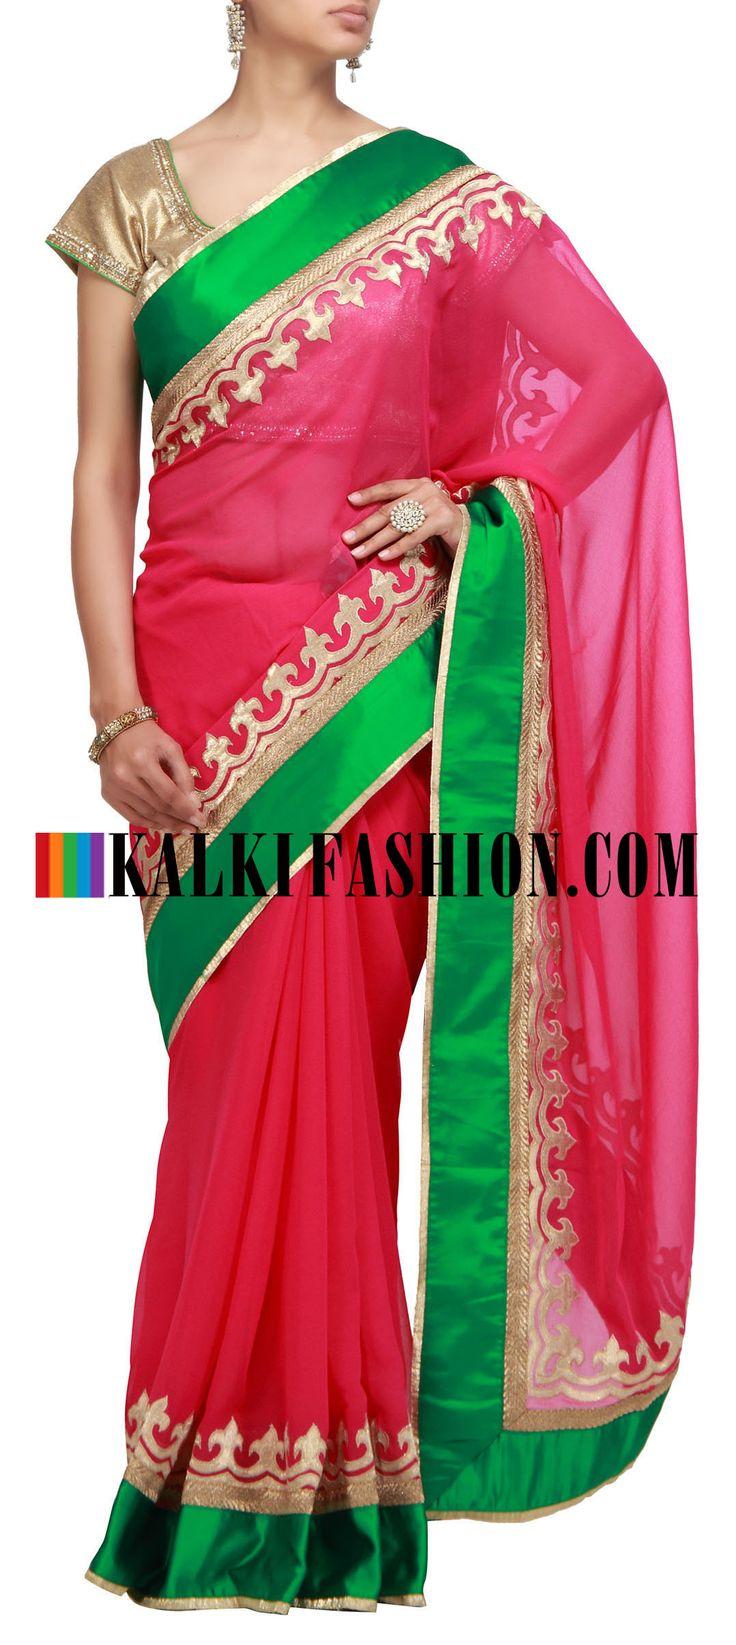 Buy it now  http://www.kalkifashion.com/pink-saree-with-applique-work.html  Pink saree with applique work